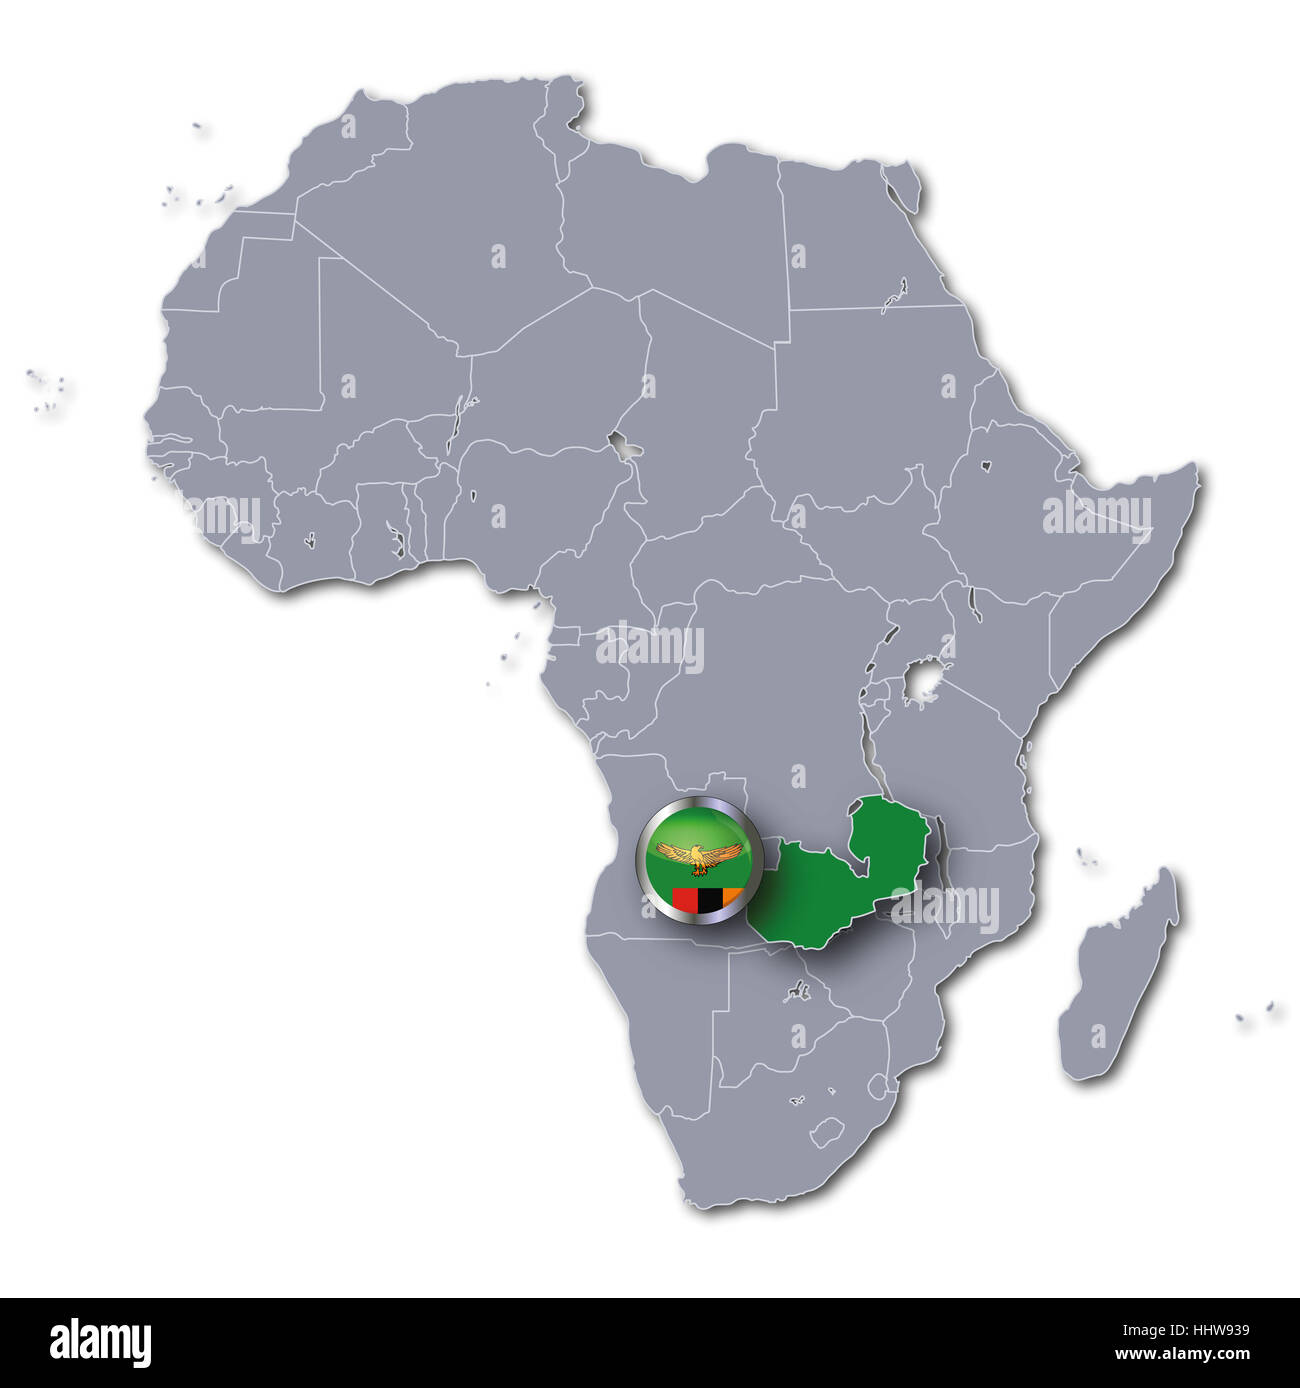 Zambia Map Of Africa.African Map Of Zambia Stock Photo 131477677 Alamy